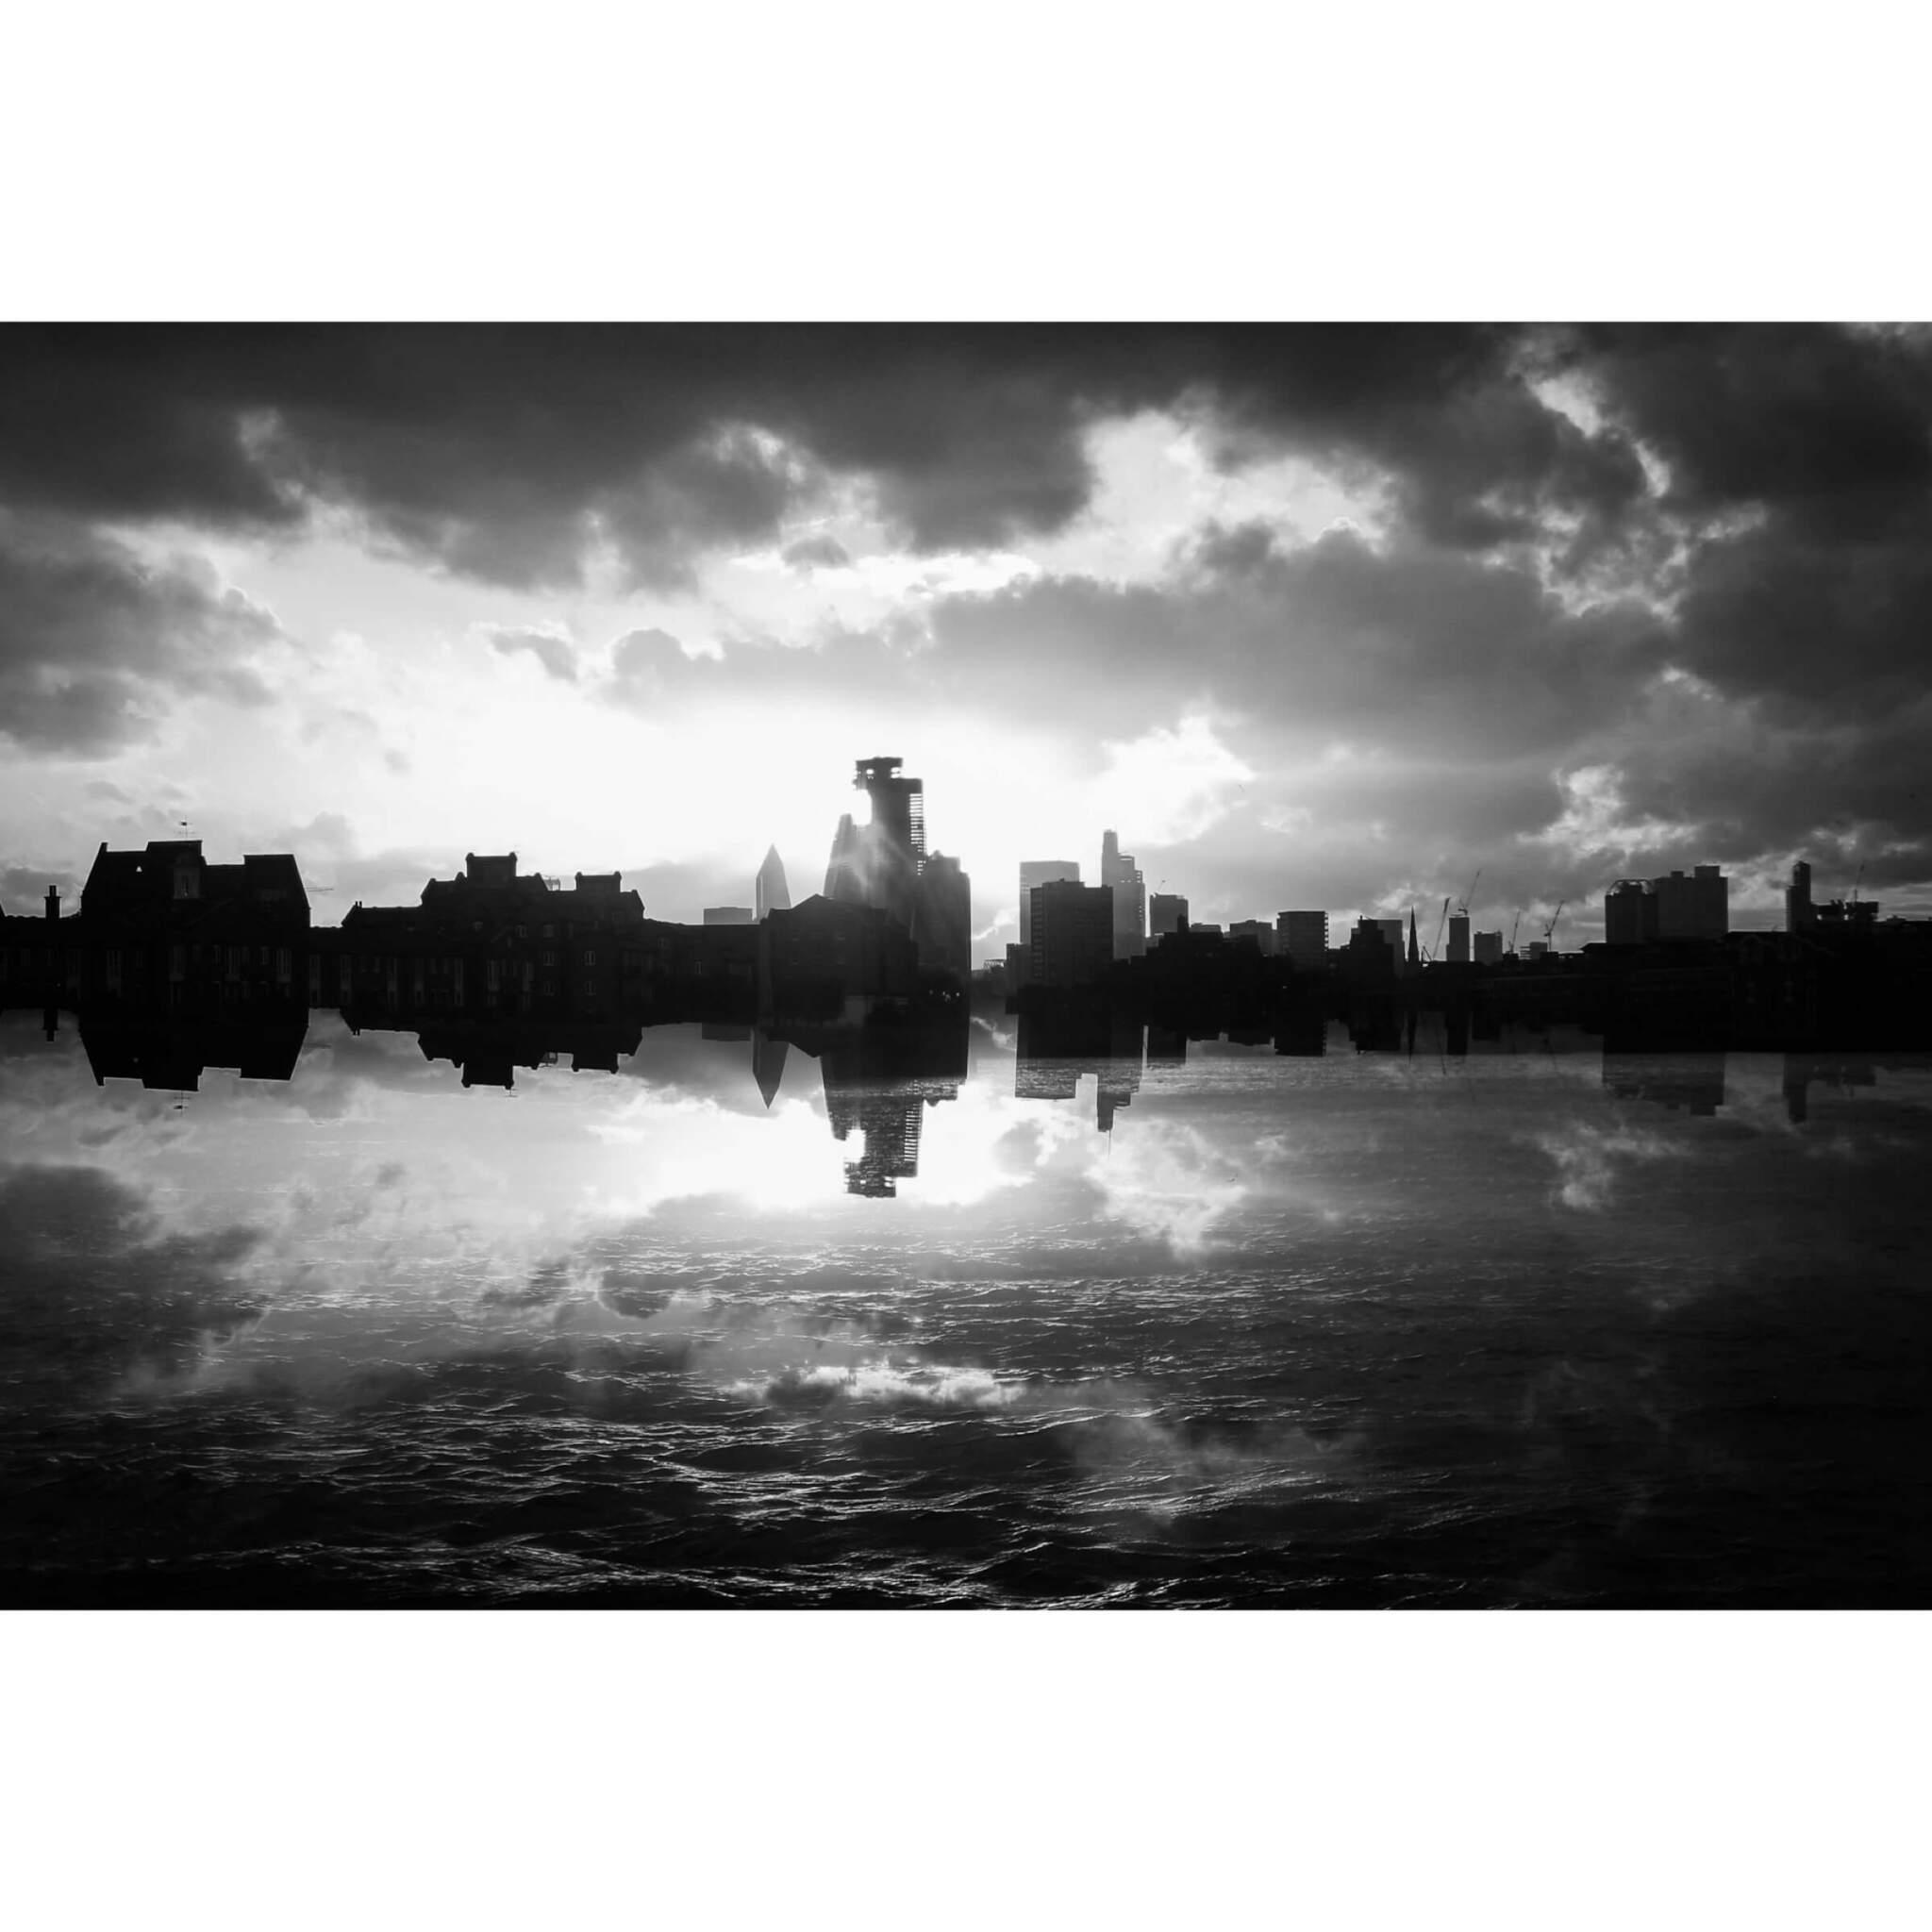 69284295 C99D 4A4A 92C3 766F5D7FCE78 - London City Skyline I